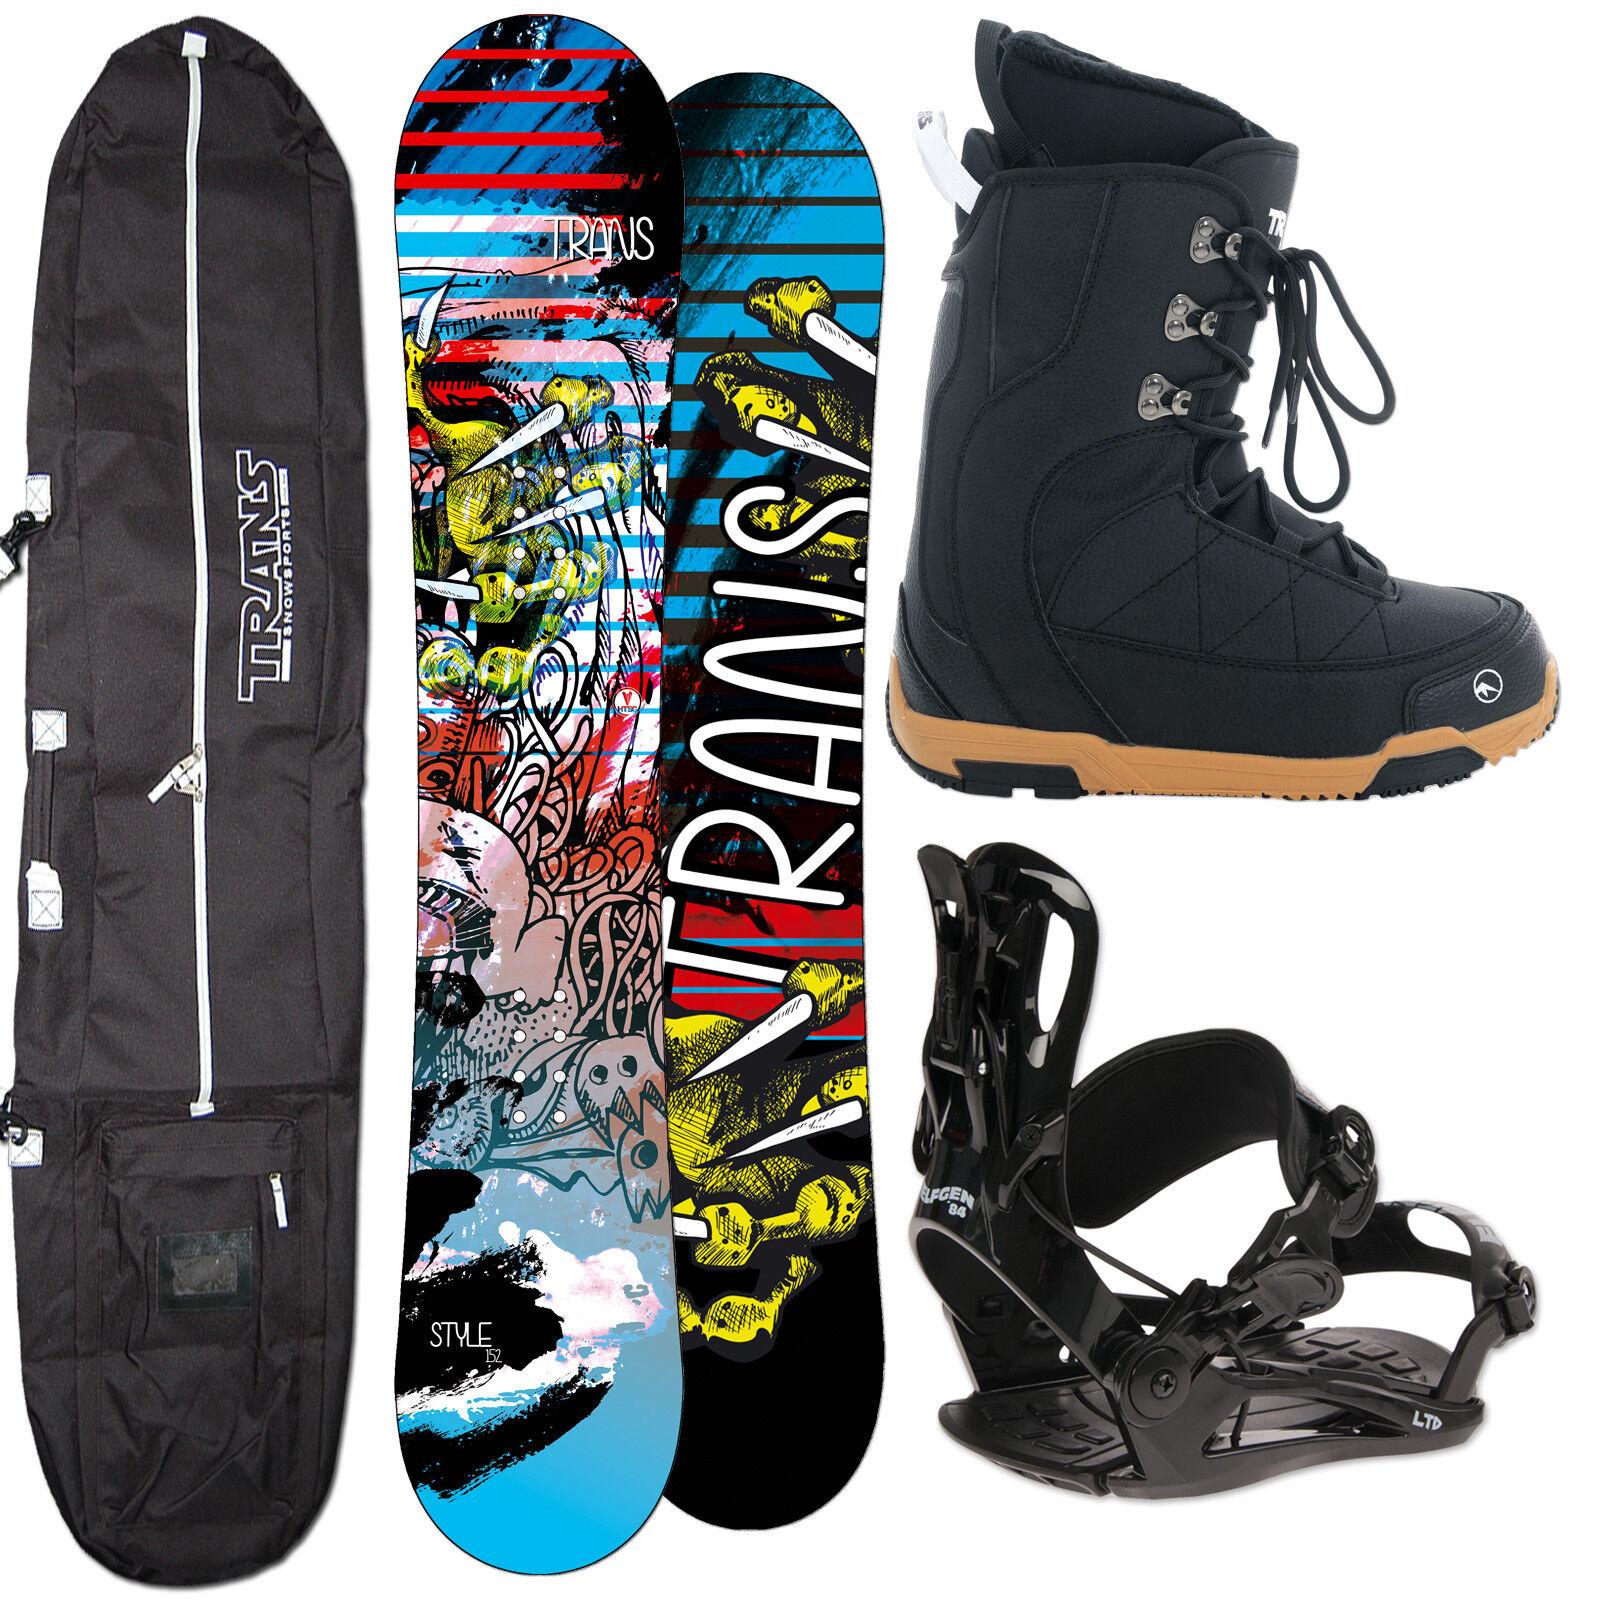 Men's Snowboard Trans Style 146 cm + Fastec Binding SIZE M + Boots+ Bag